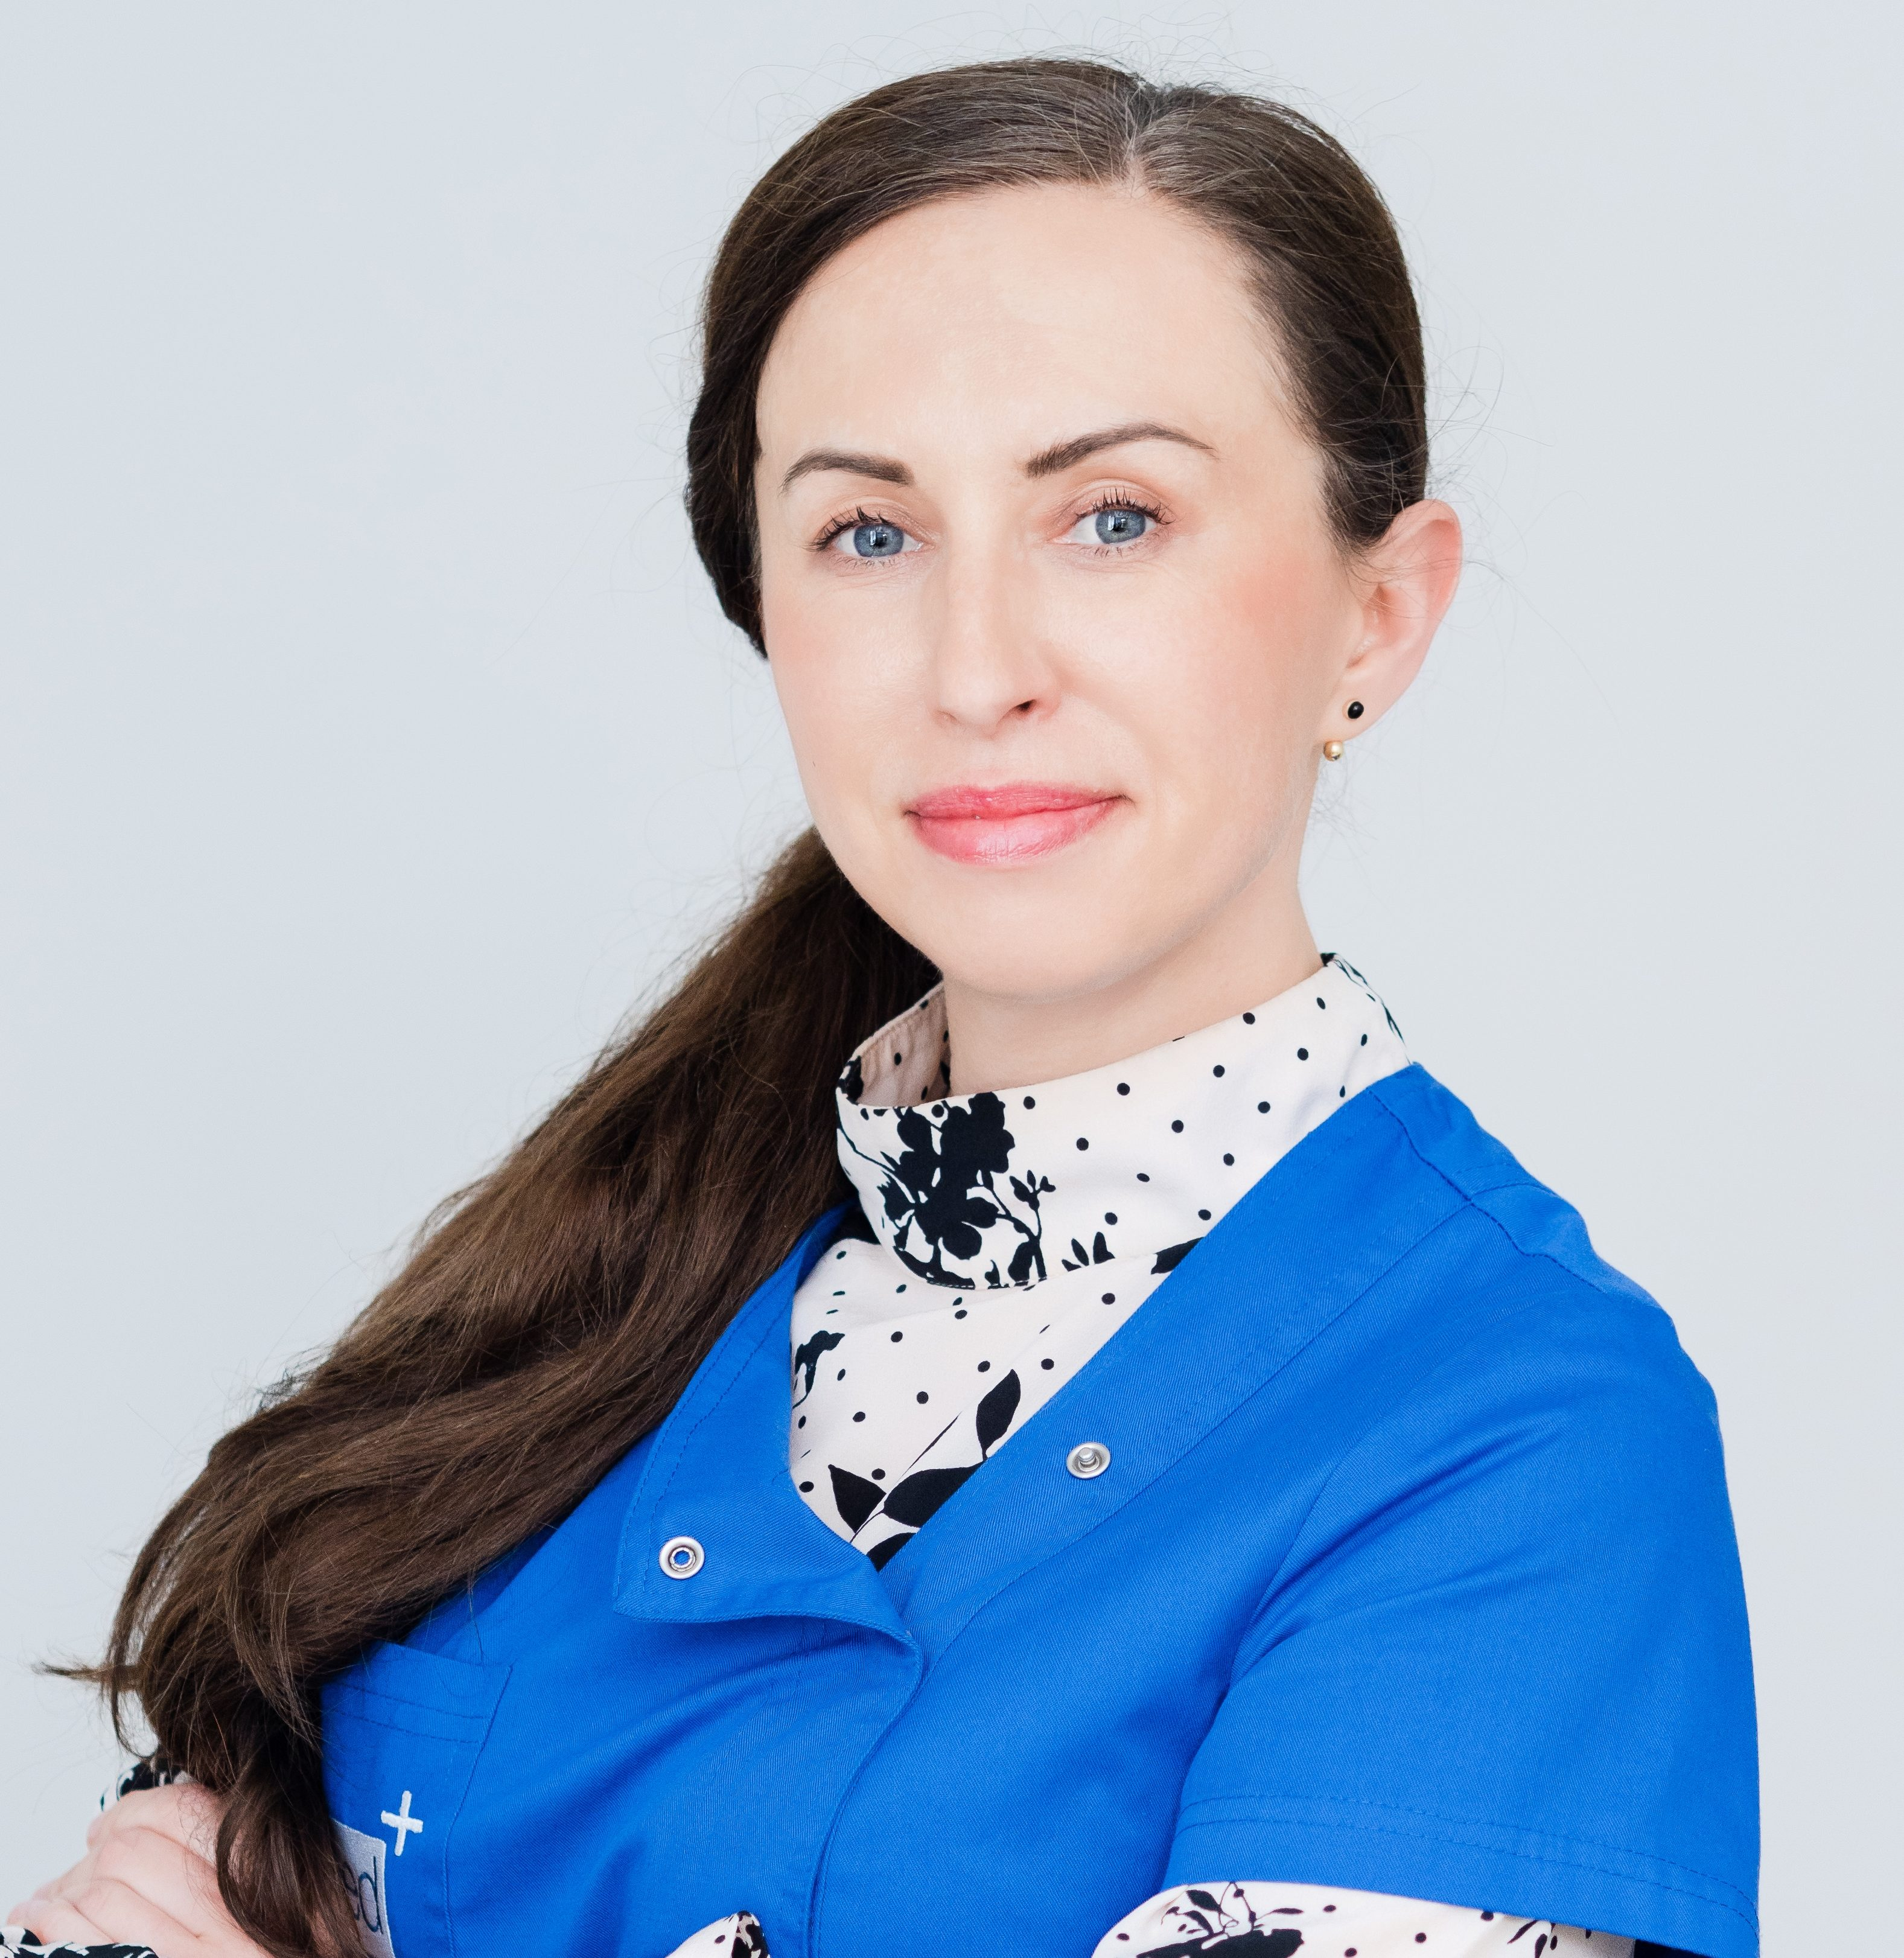 dr n.med. Małgorzata Iwanejko